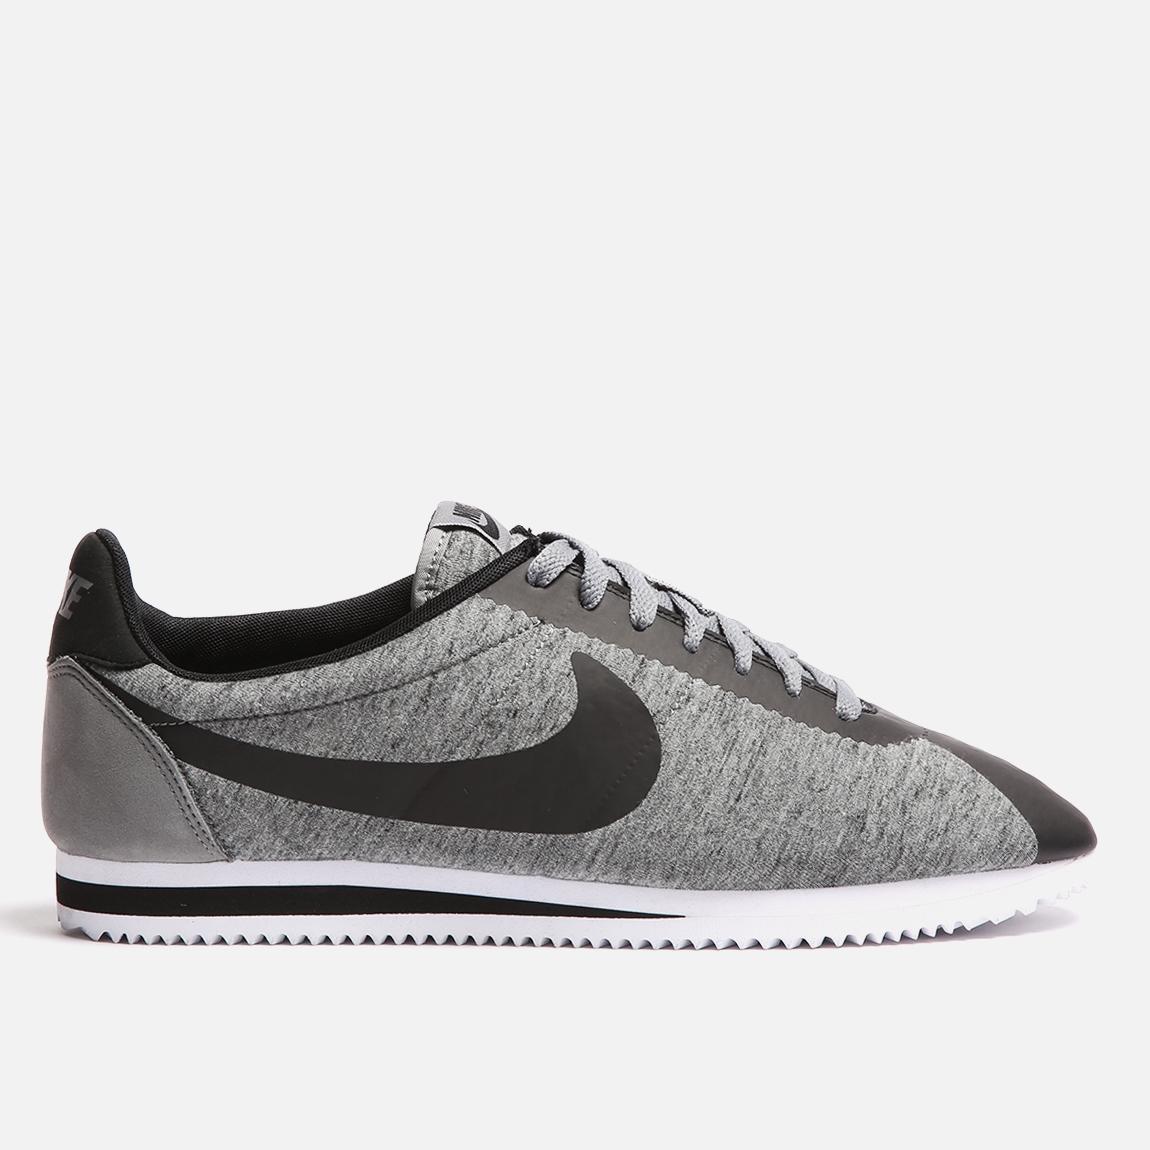 huge selection of 351b9 b6a32 MENS Classic Cortez TP - 749654-002 - Tumbled Grey  Black Nike Sneakers   Superbalist.com